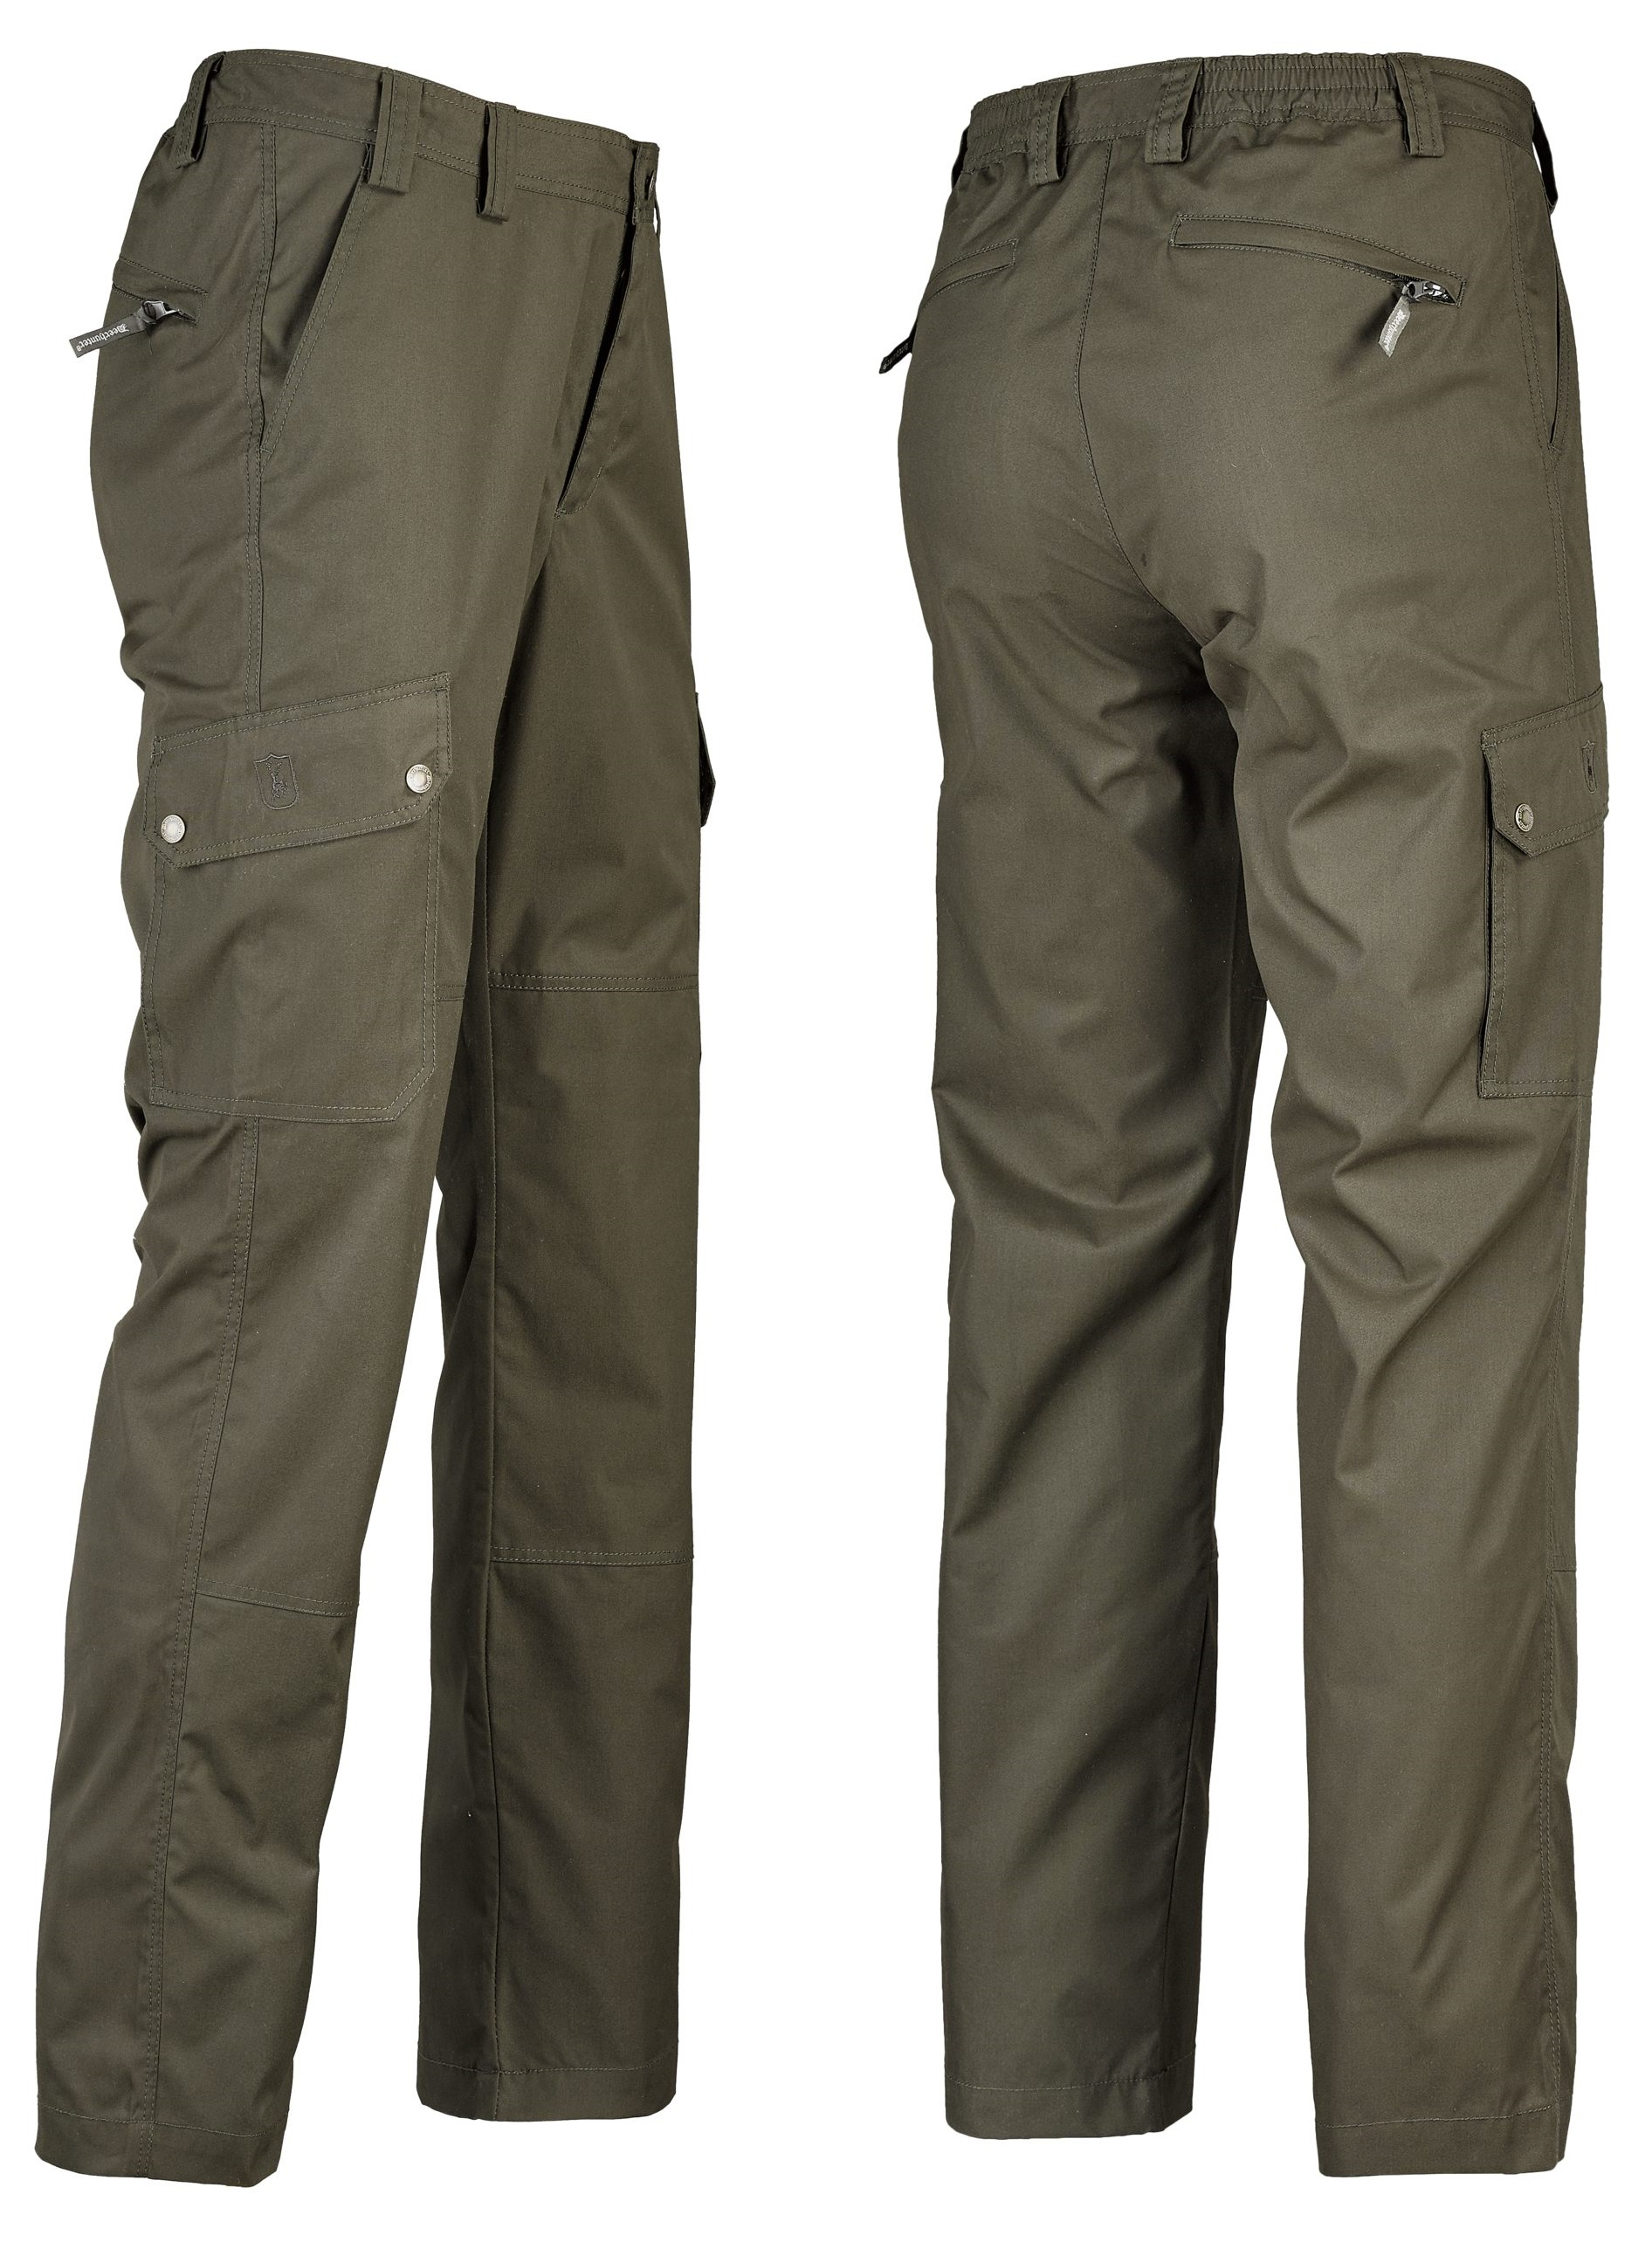 Pantaloni de trekking Deerhunter Lofoten